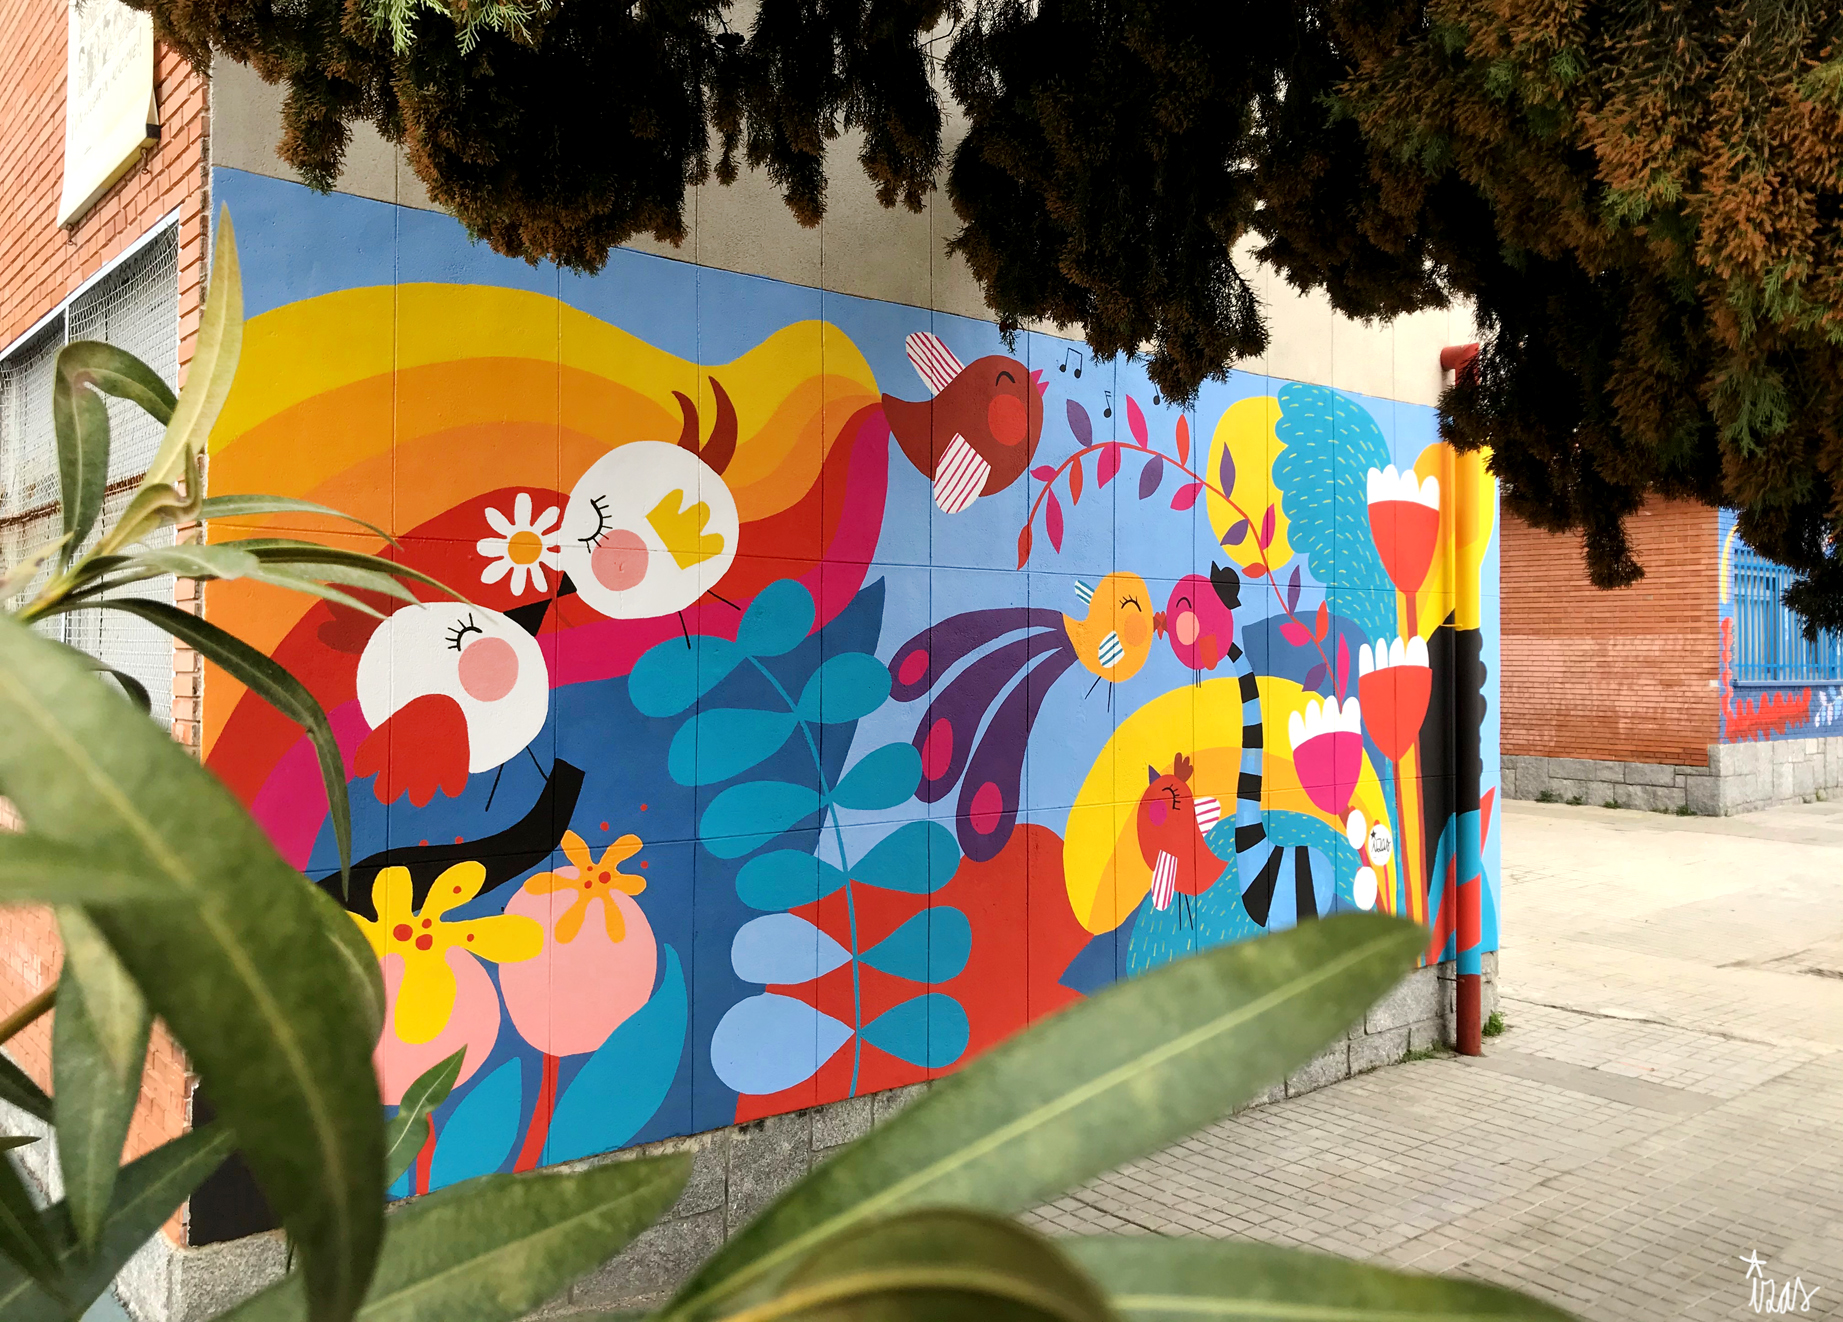 mural izas azulpatio ceip santo domingo flores izquierda